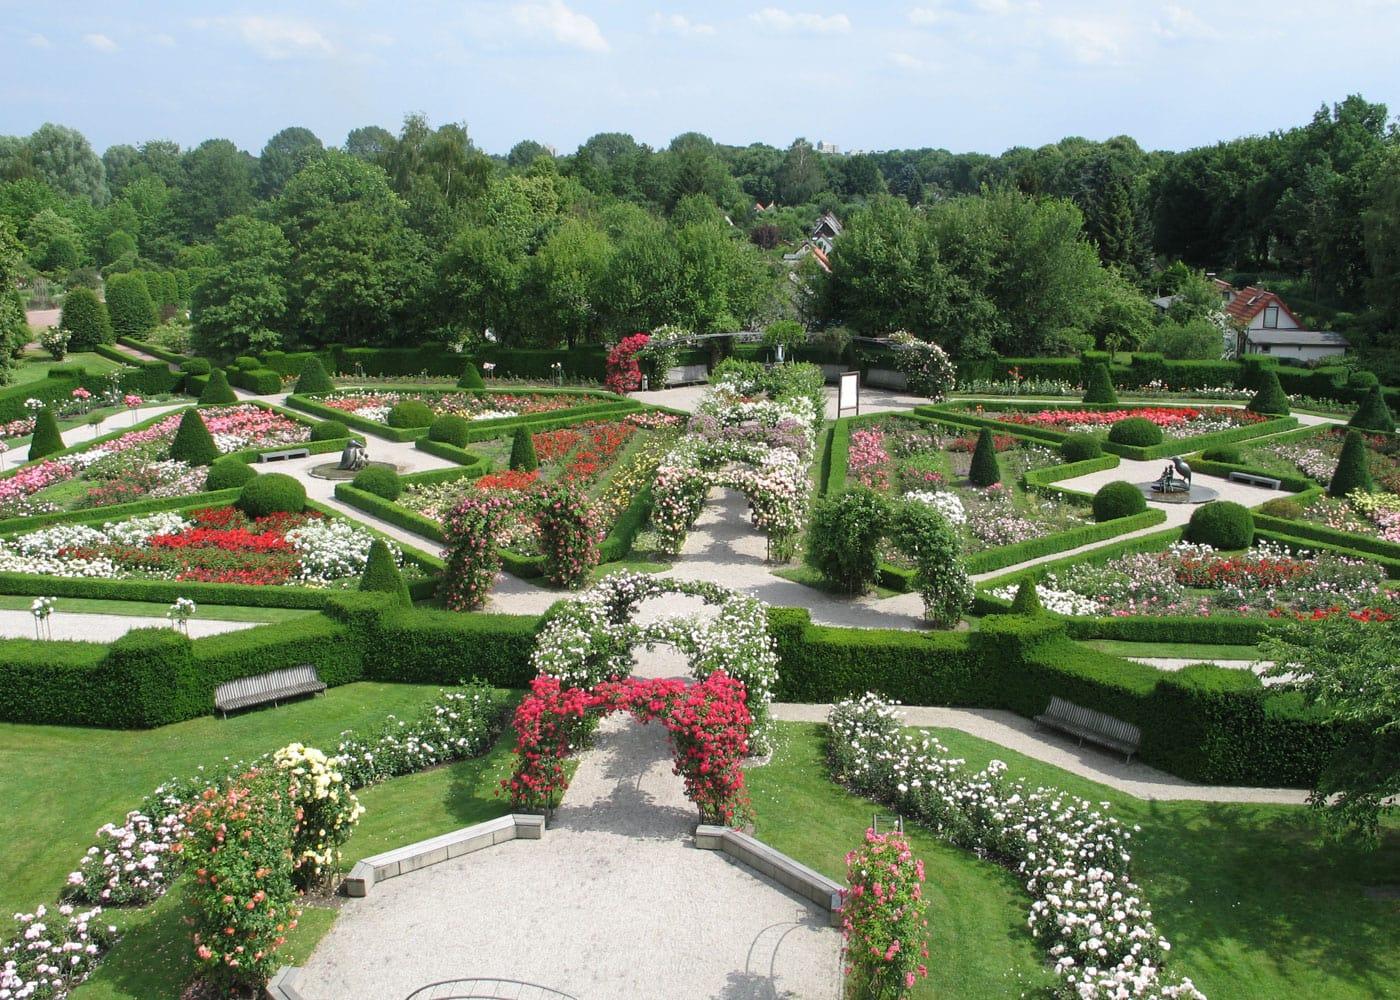 Ausflug in Berlin mit Kindern: Rosengarten im Britzer Garten // HIMBEER